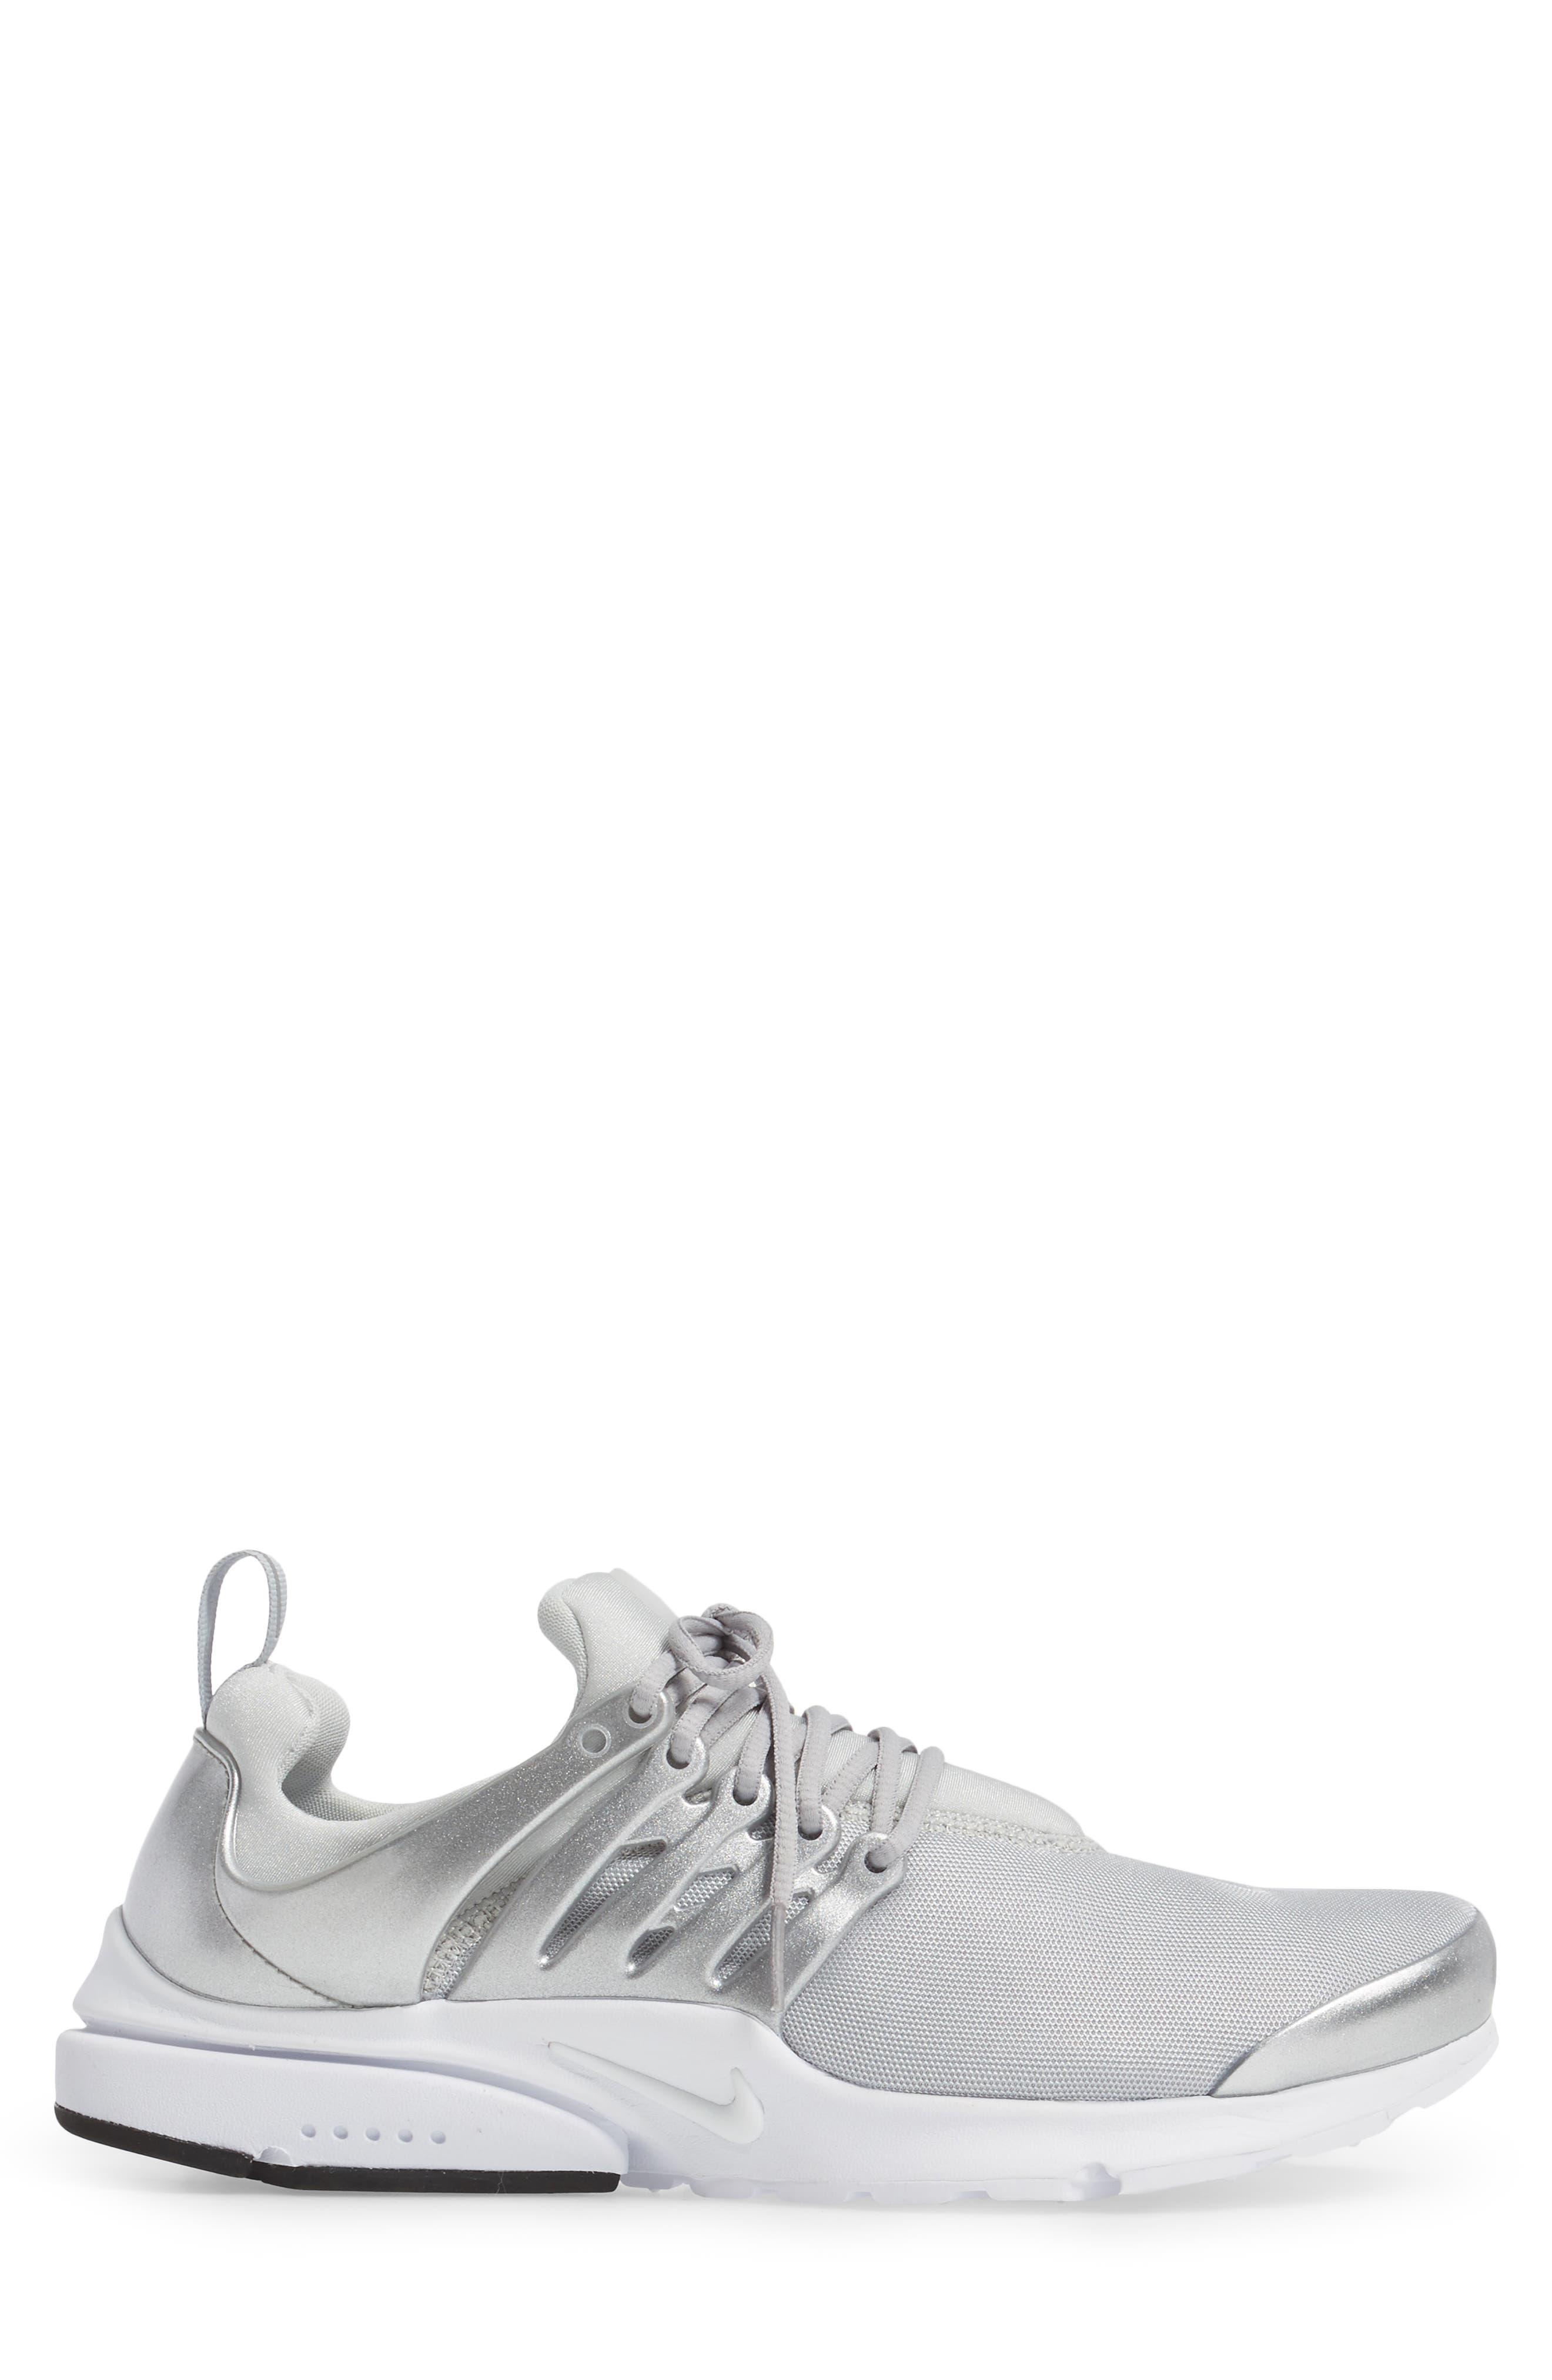 Air Presto Premium Sneaker,                             Alternate thumbnail 3, color,                             021